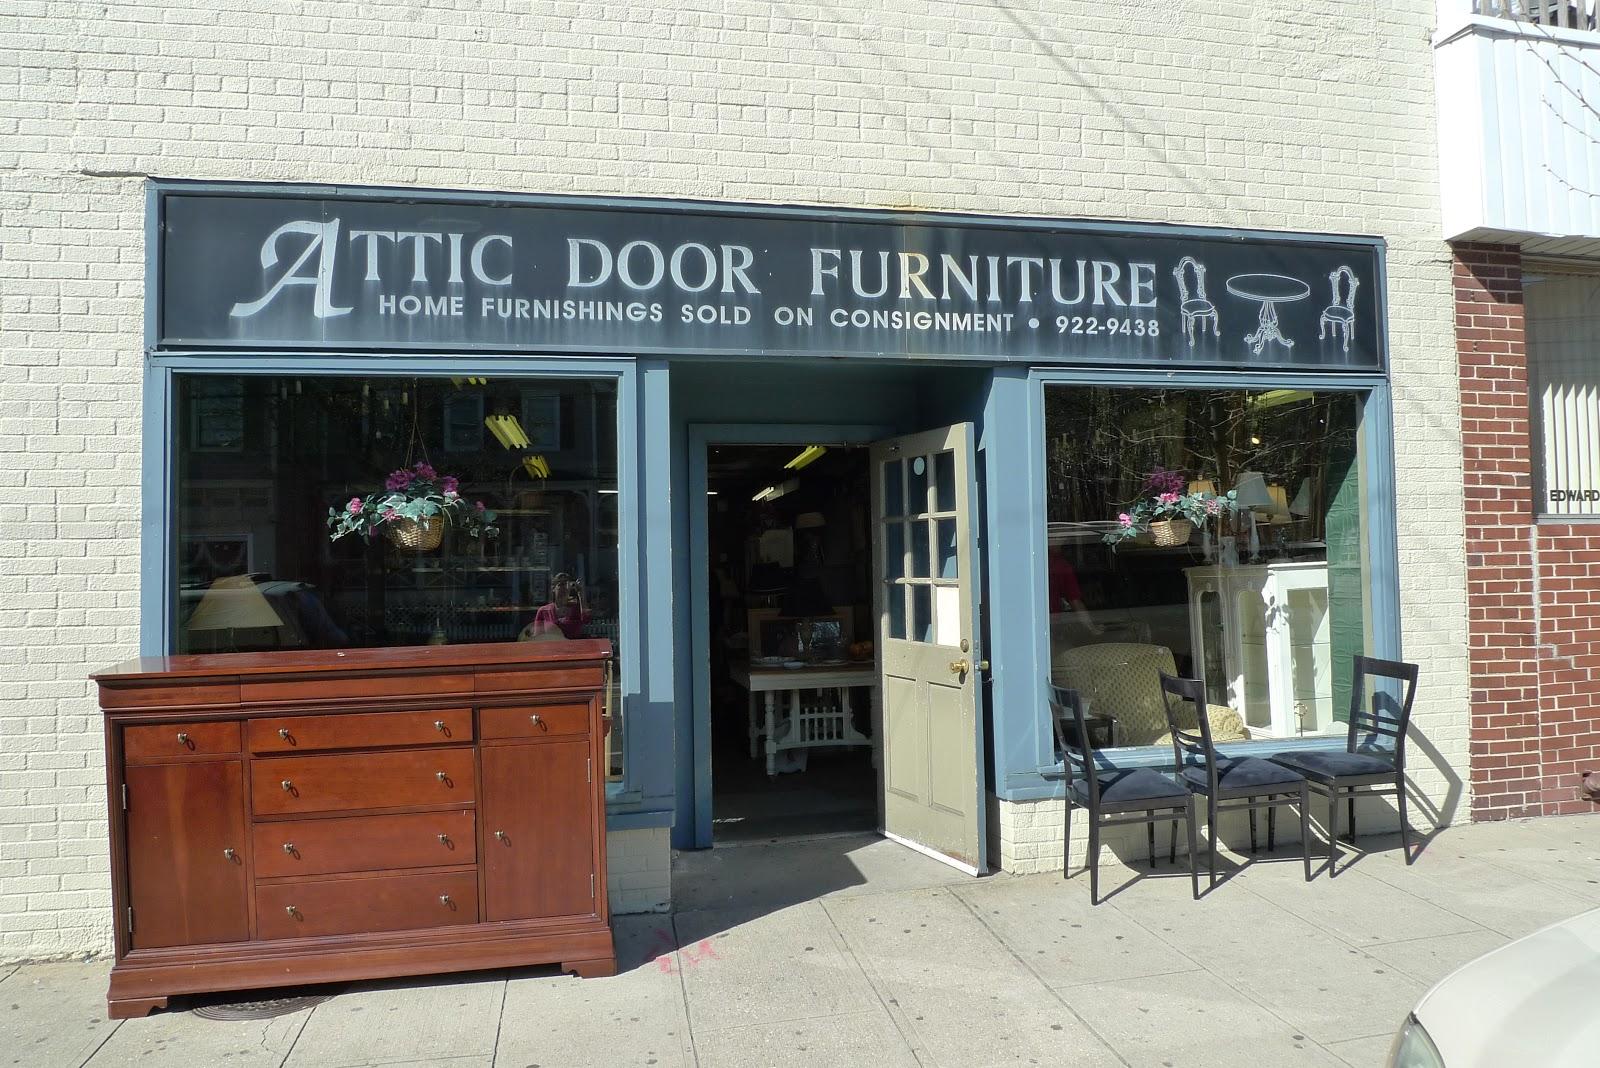 Attic Door Furniture - 33 East Main Street Oyster Bay NY & Wares On Wednesdays: Attic Door Furniture - 33 East Main Street ...